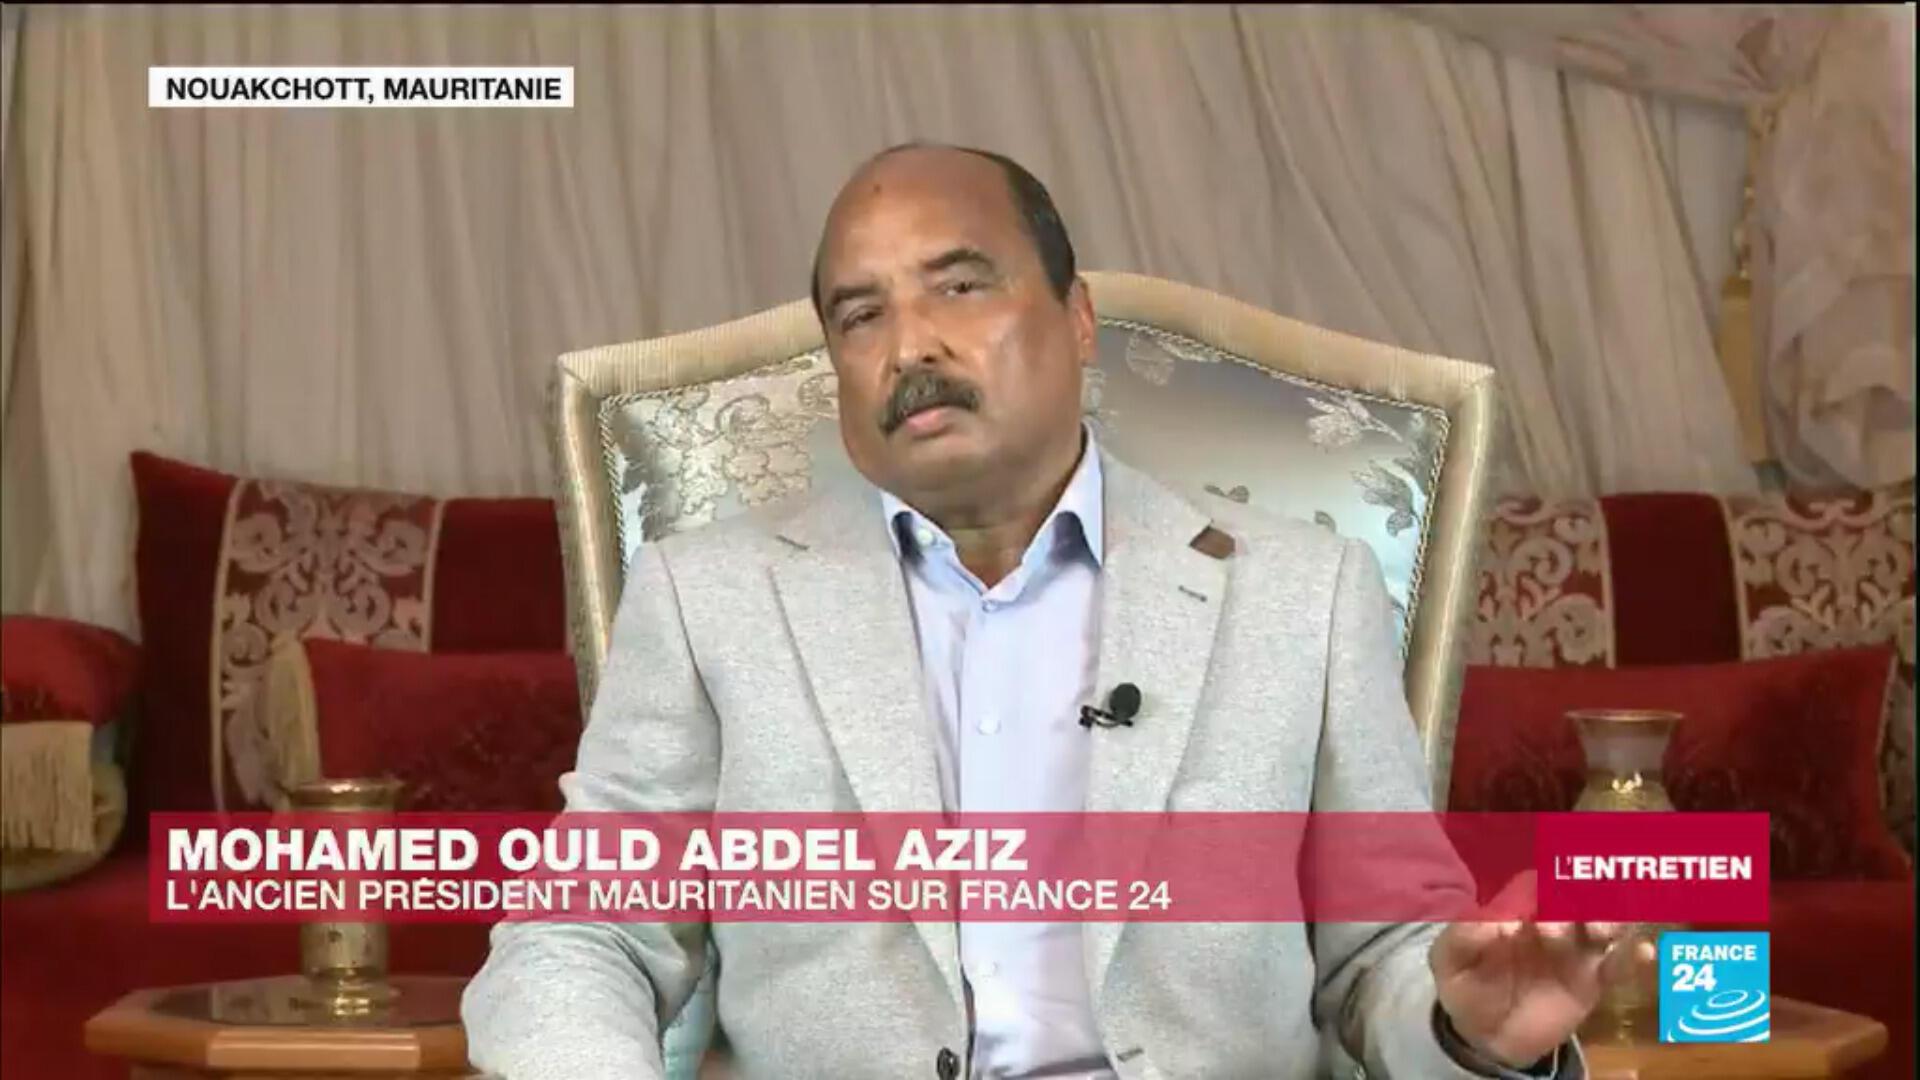 L'ancien président mauritanien, Mohamed Ould Abdel Aziz